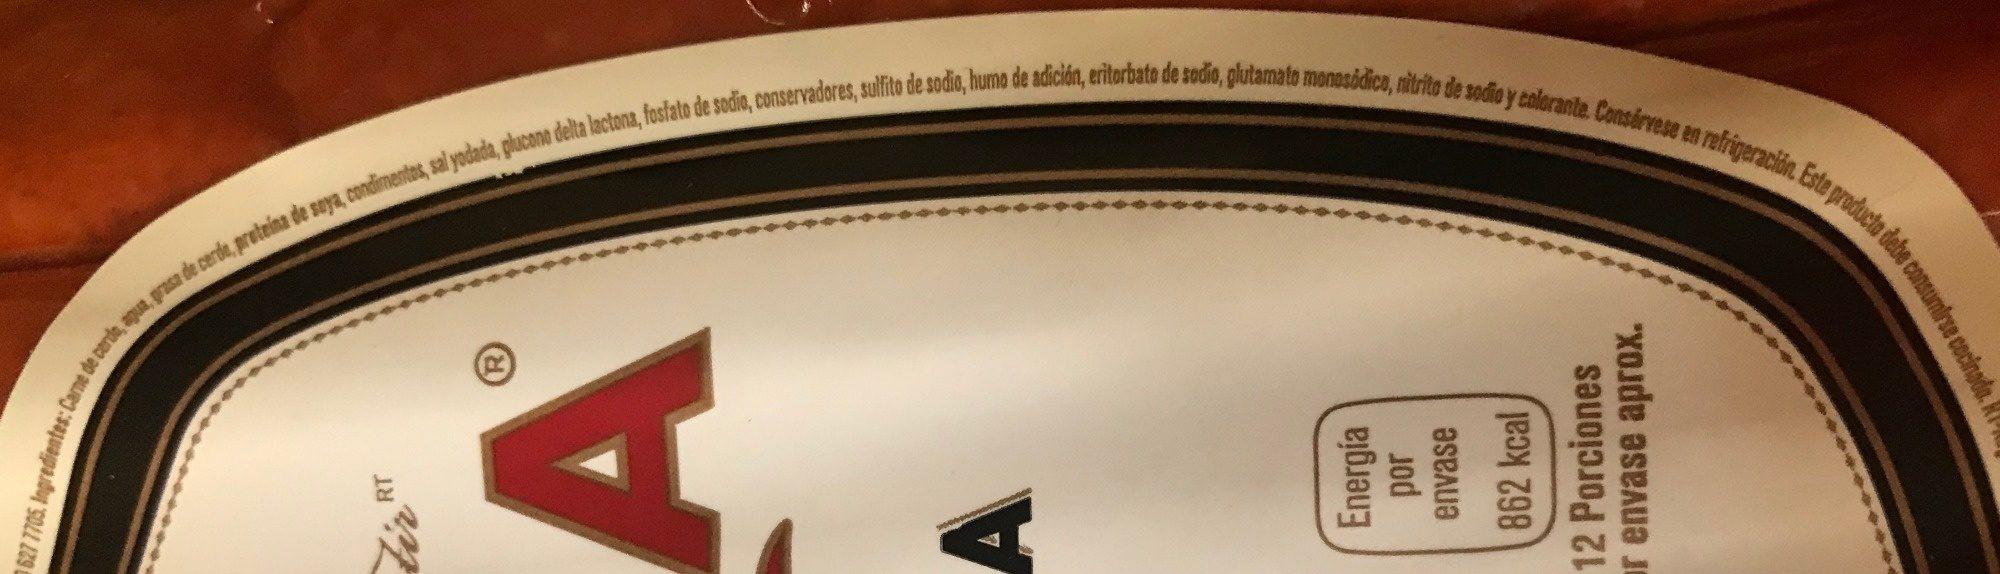 CHISTORRA PARMA - Ingrediënten - es